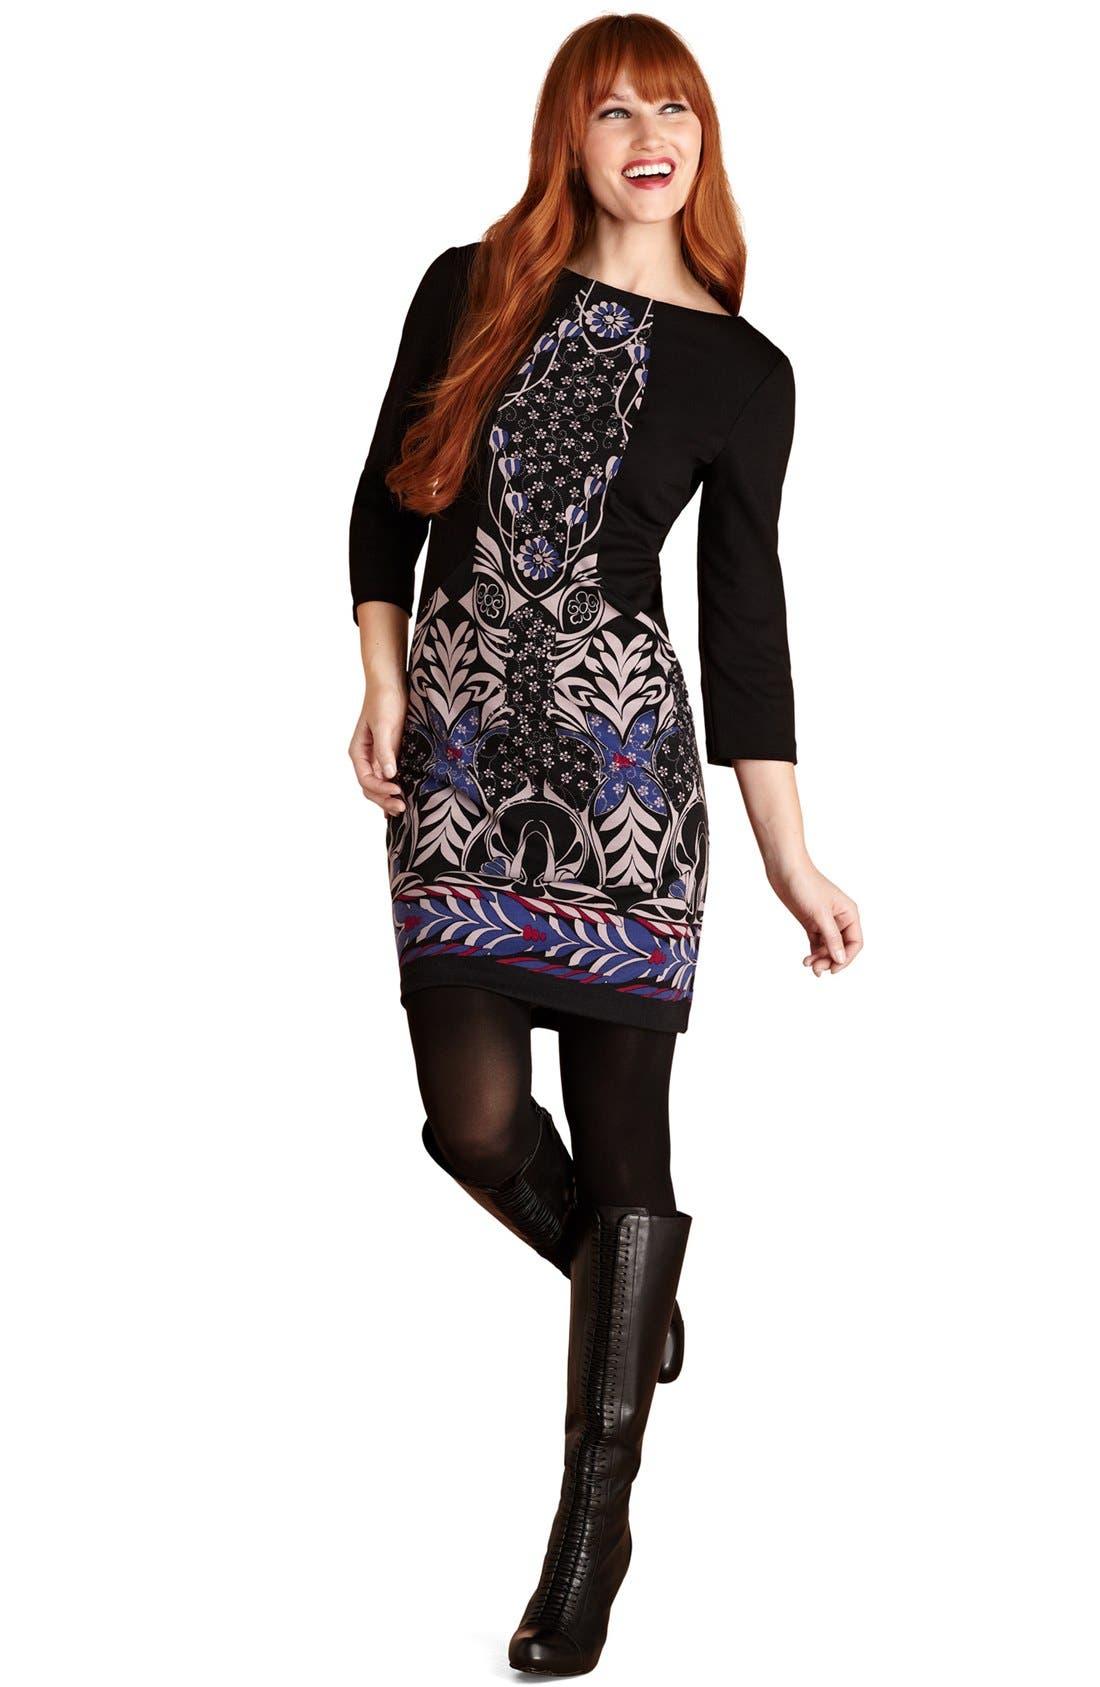 Alternate Image 1 Selected - Donna Morgan Print Ponte Knit Dress